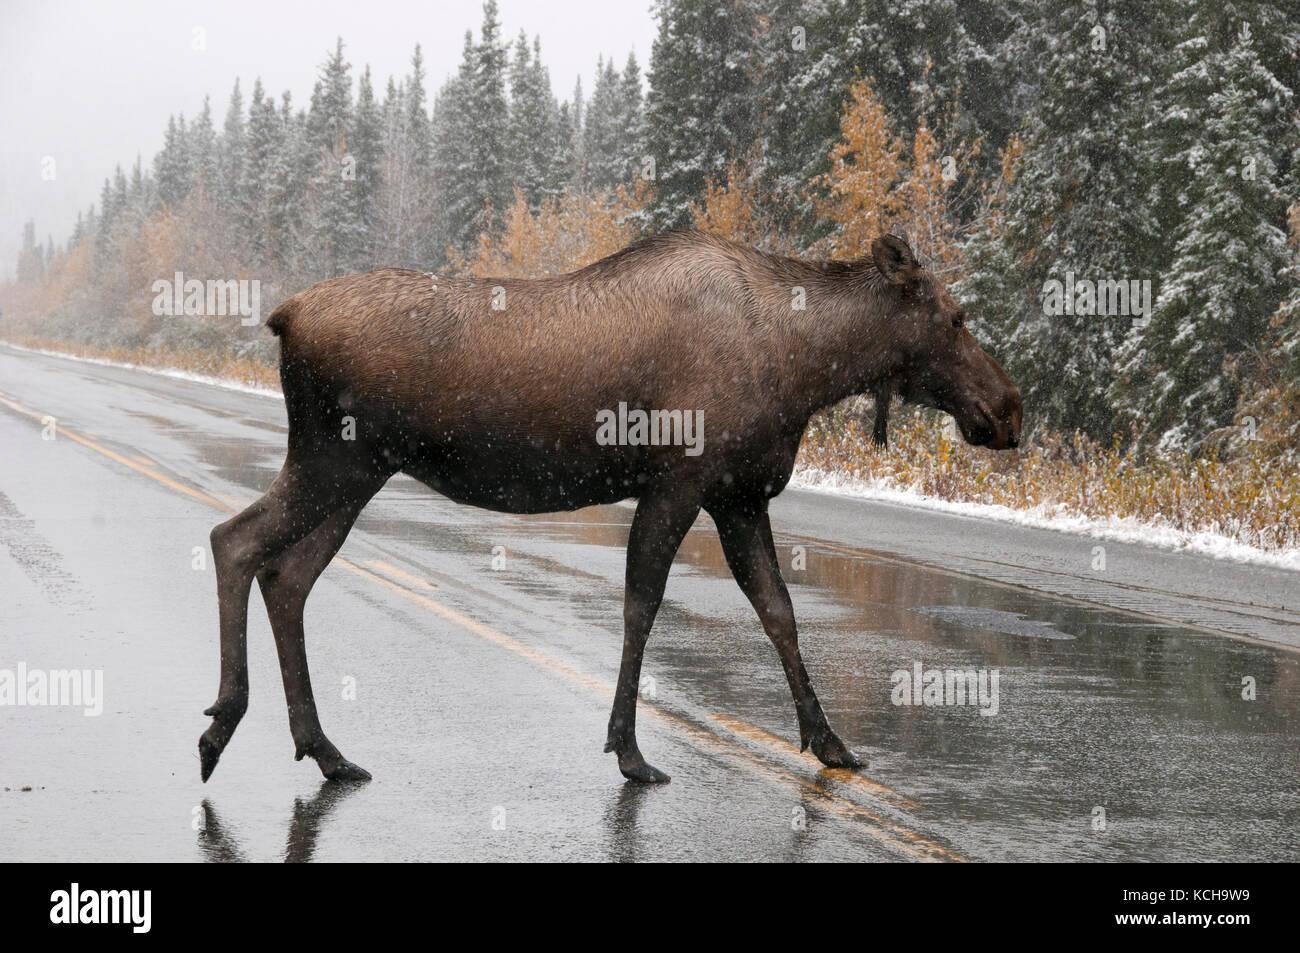 Cow Moose (Alces alces) crossing wet, icy highway in first snows of winter season.  Alaska Hwy, Alaska. - Stock Image